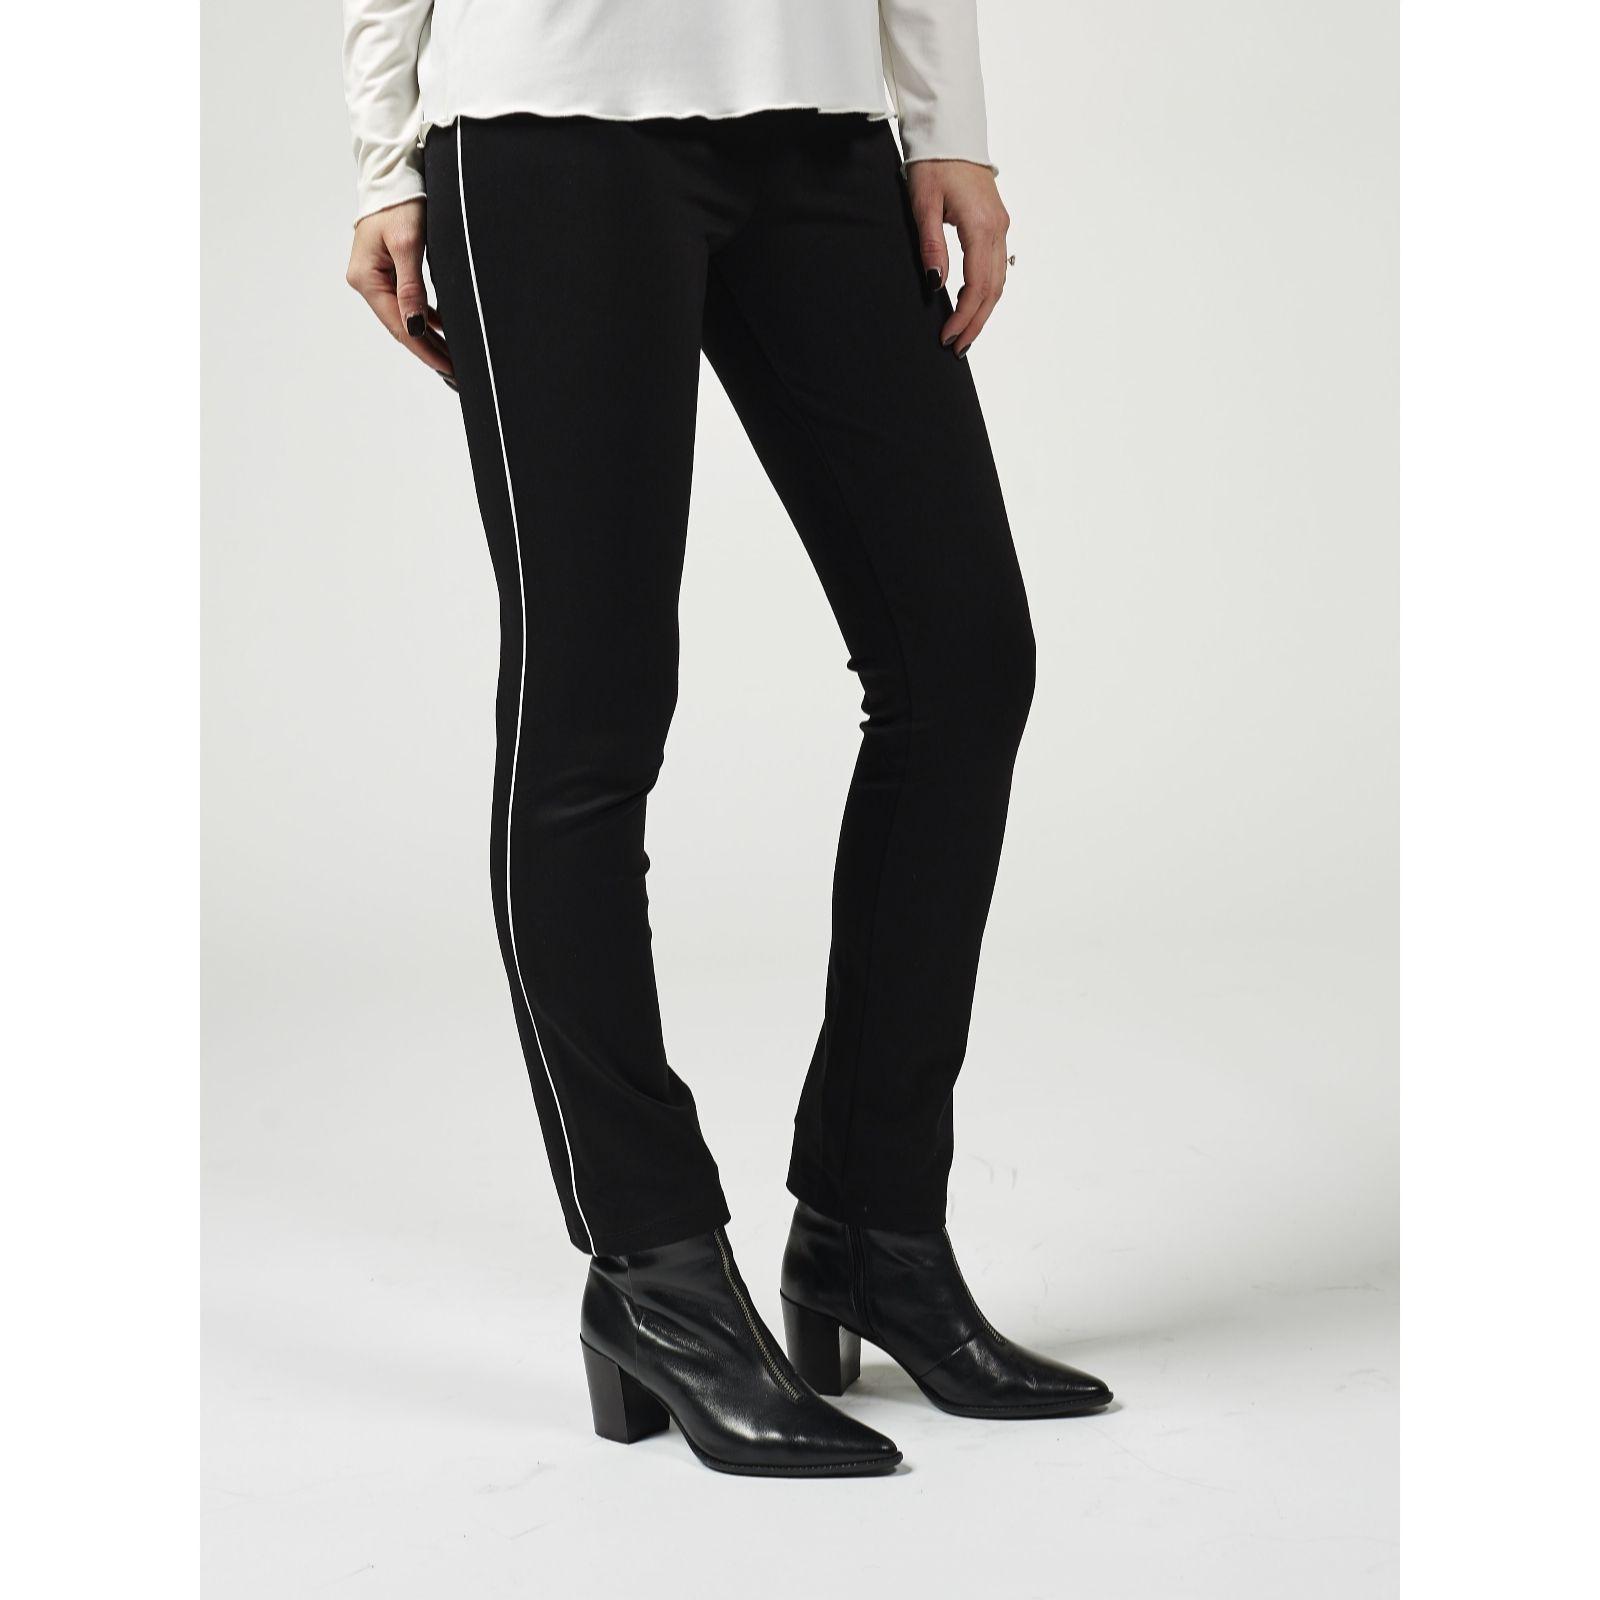 KüHn Ladies M & S Navy Polyester Trousers Size 8 Medium Wide Pinstripe In Material Hosen Kleidung & Accessoires